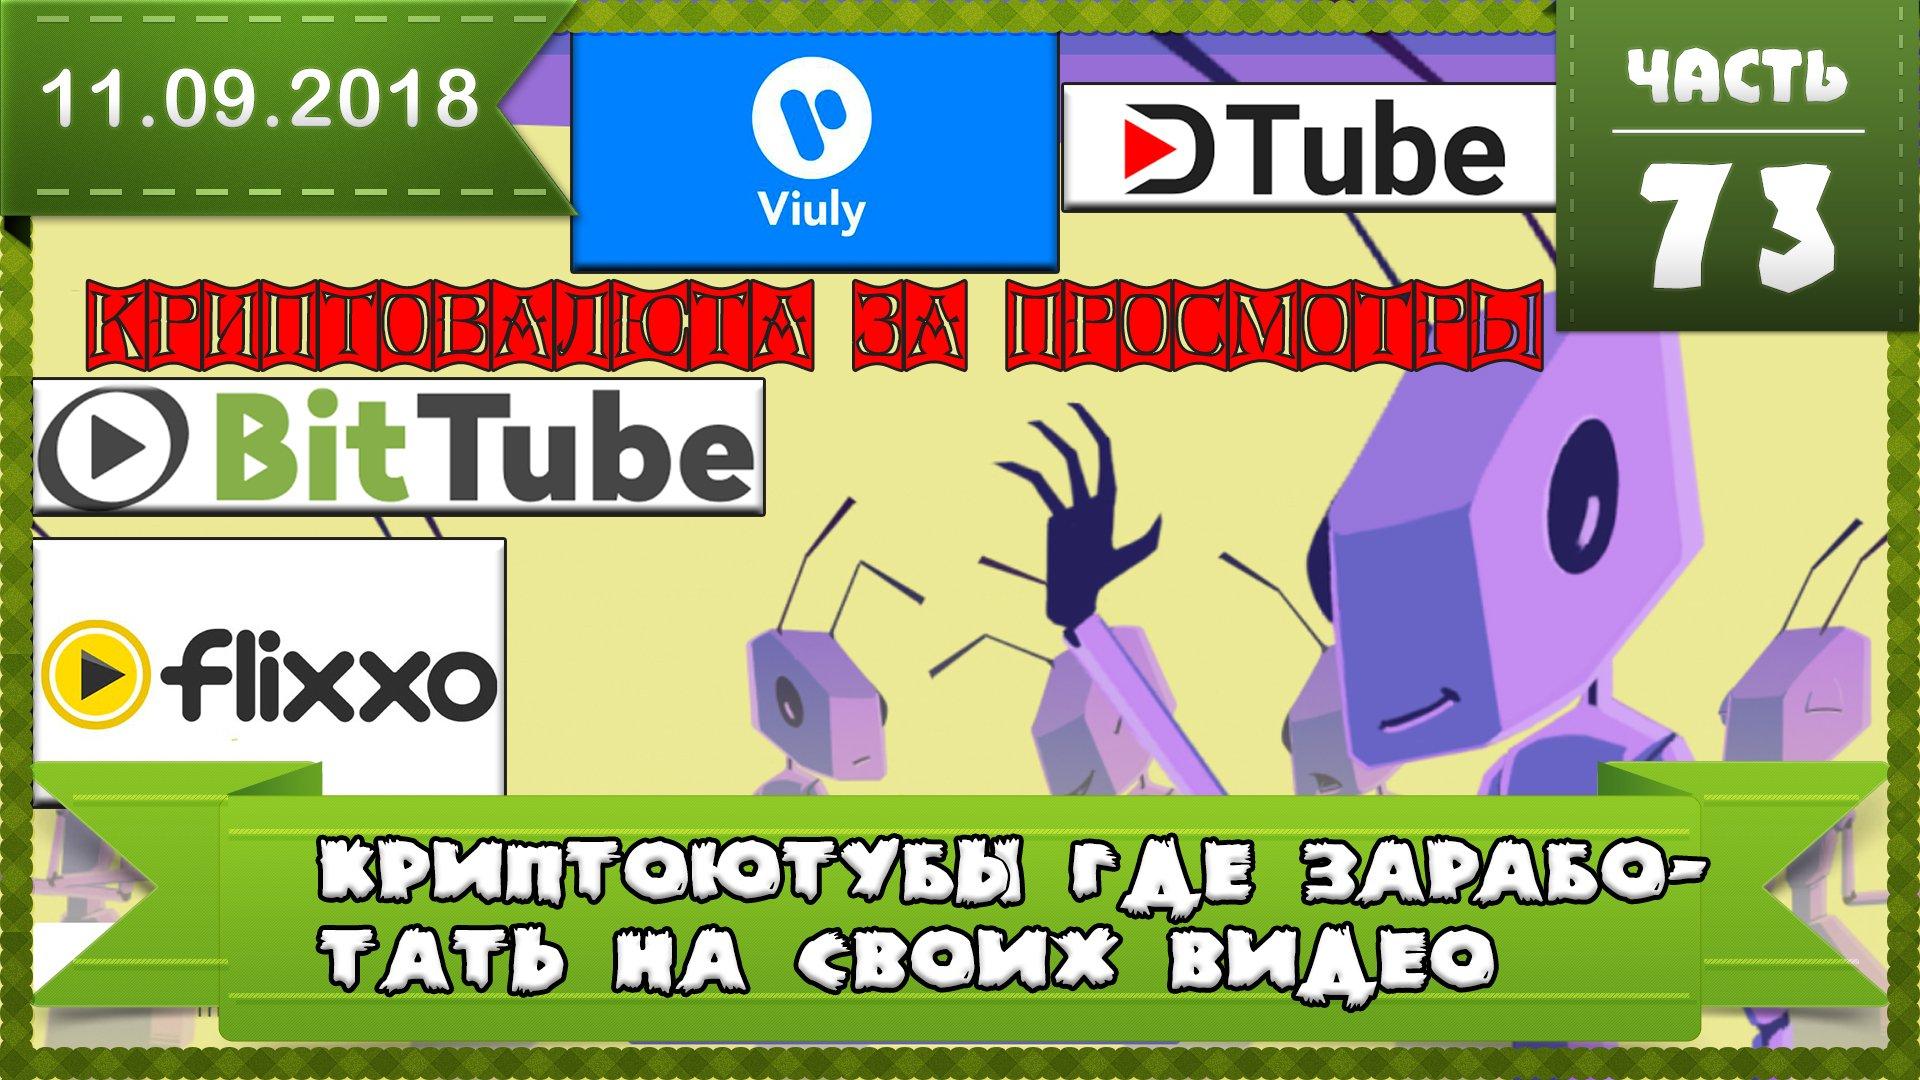 Аналоги ютуба Bittube Viuly Dtube Flixxo на блокчейне, монтетизация криптовалютой, YouTube за крипту